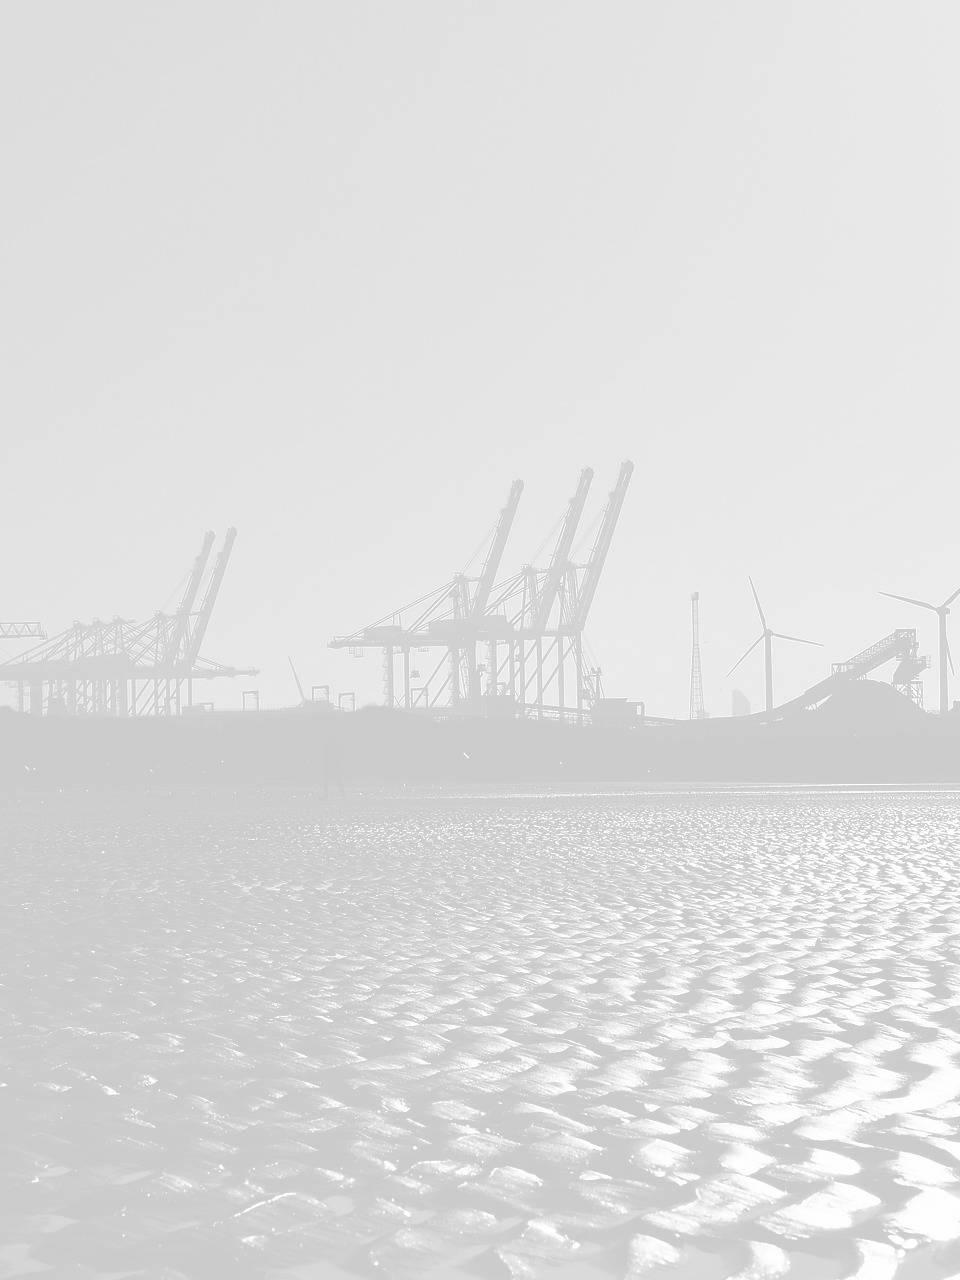 seo liverpool image of liverpool docks